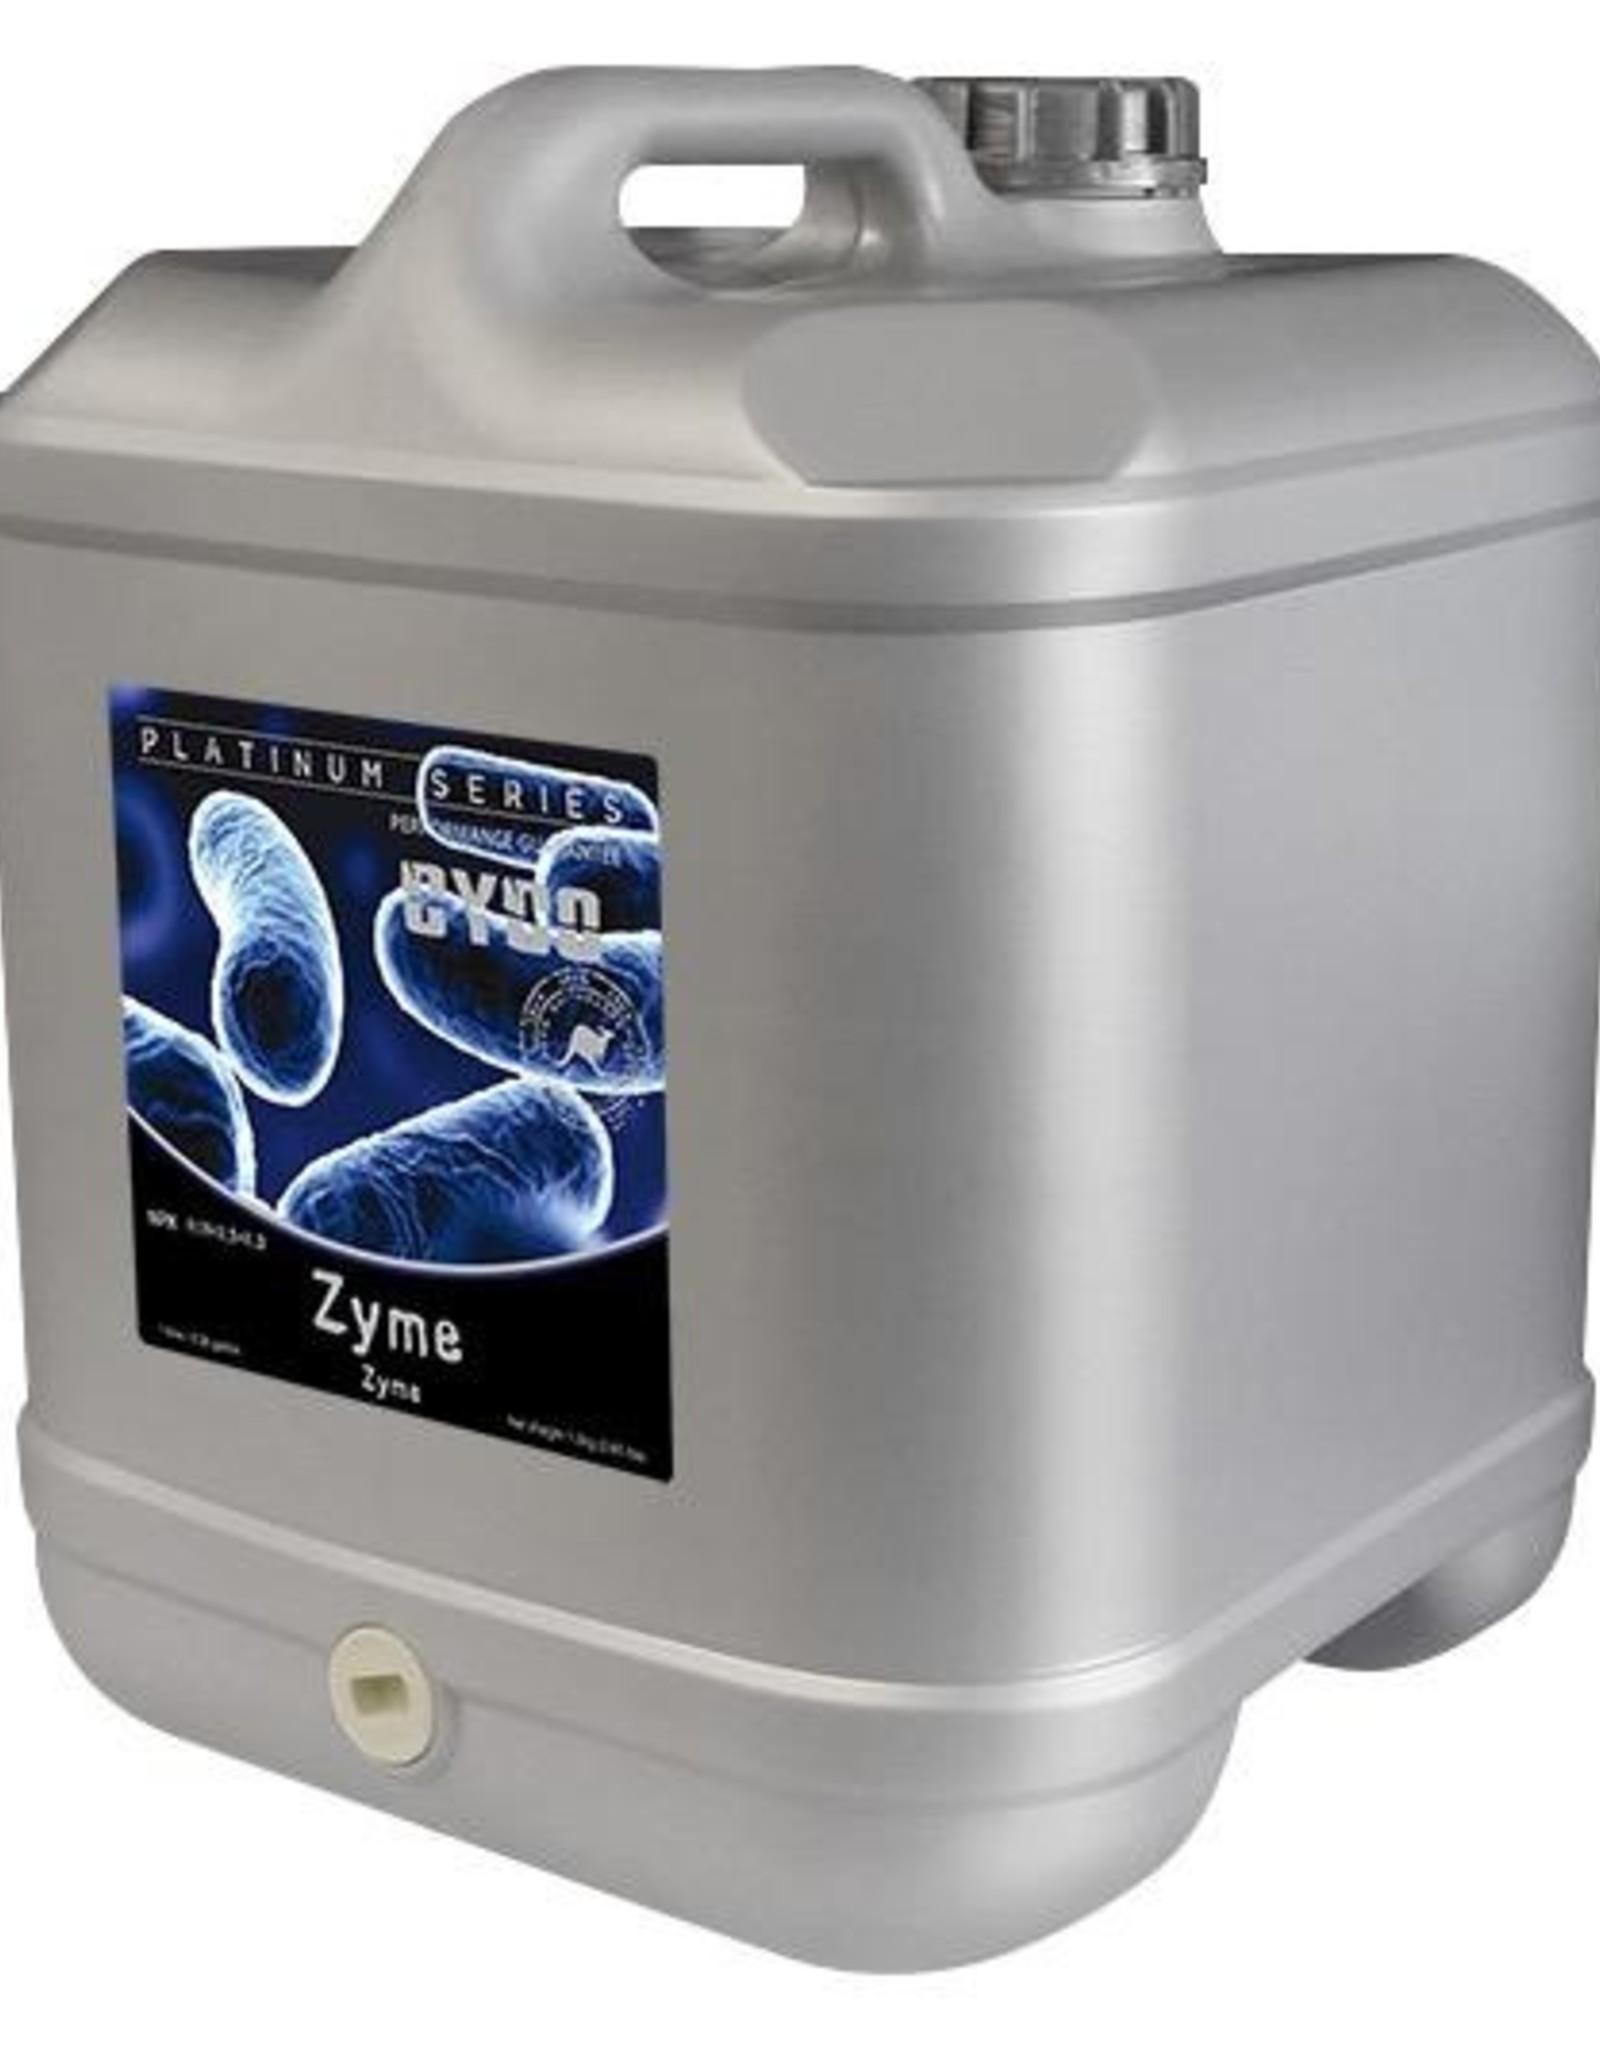 CYCO CYCO Zyme 20 Liter